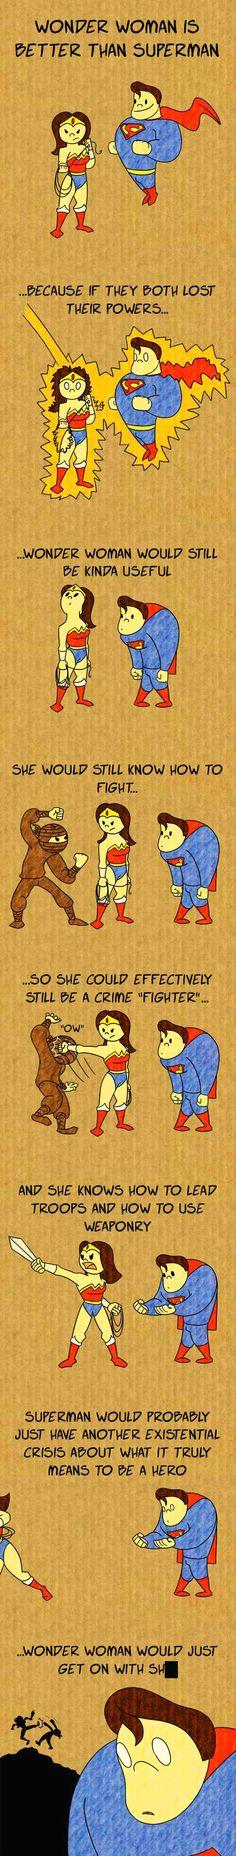 Wonder Woman vs. Super Man…